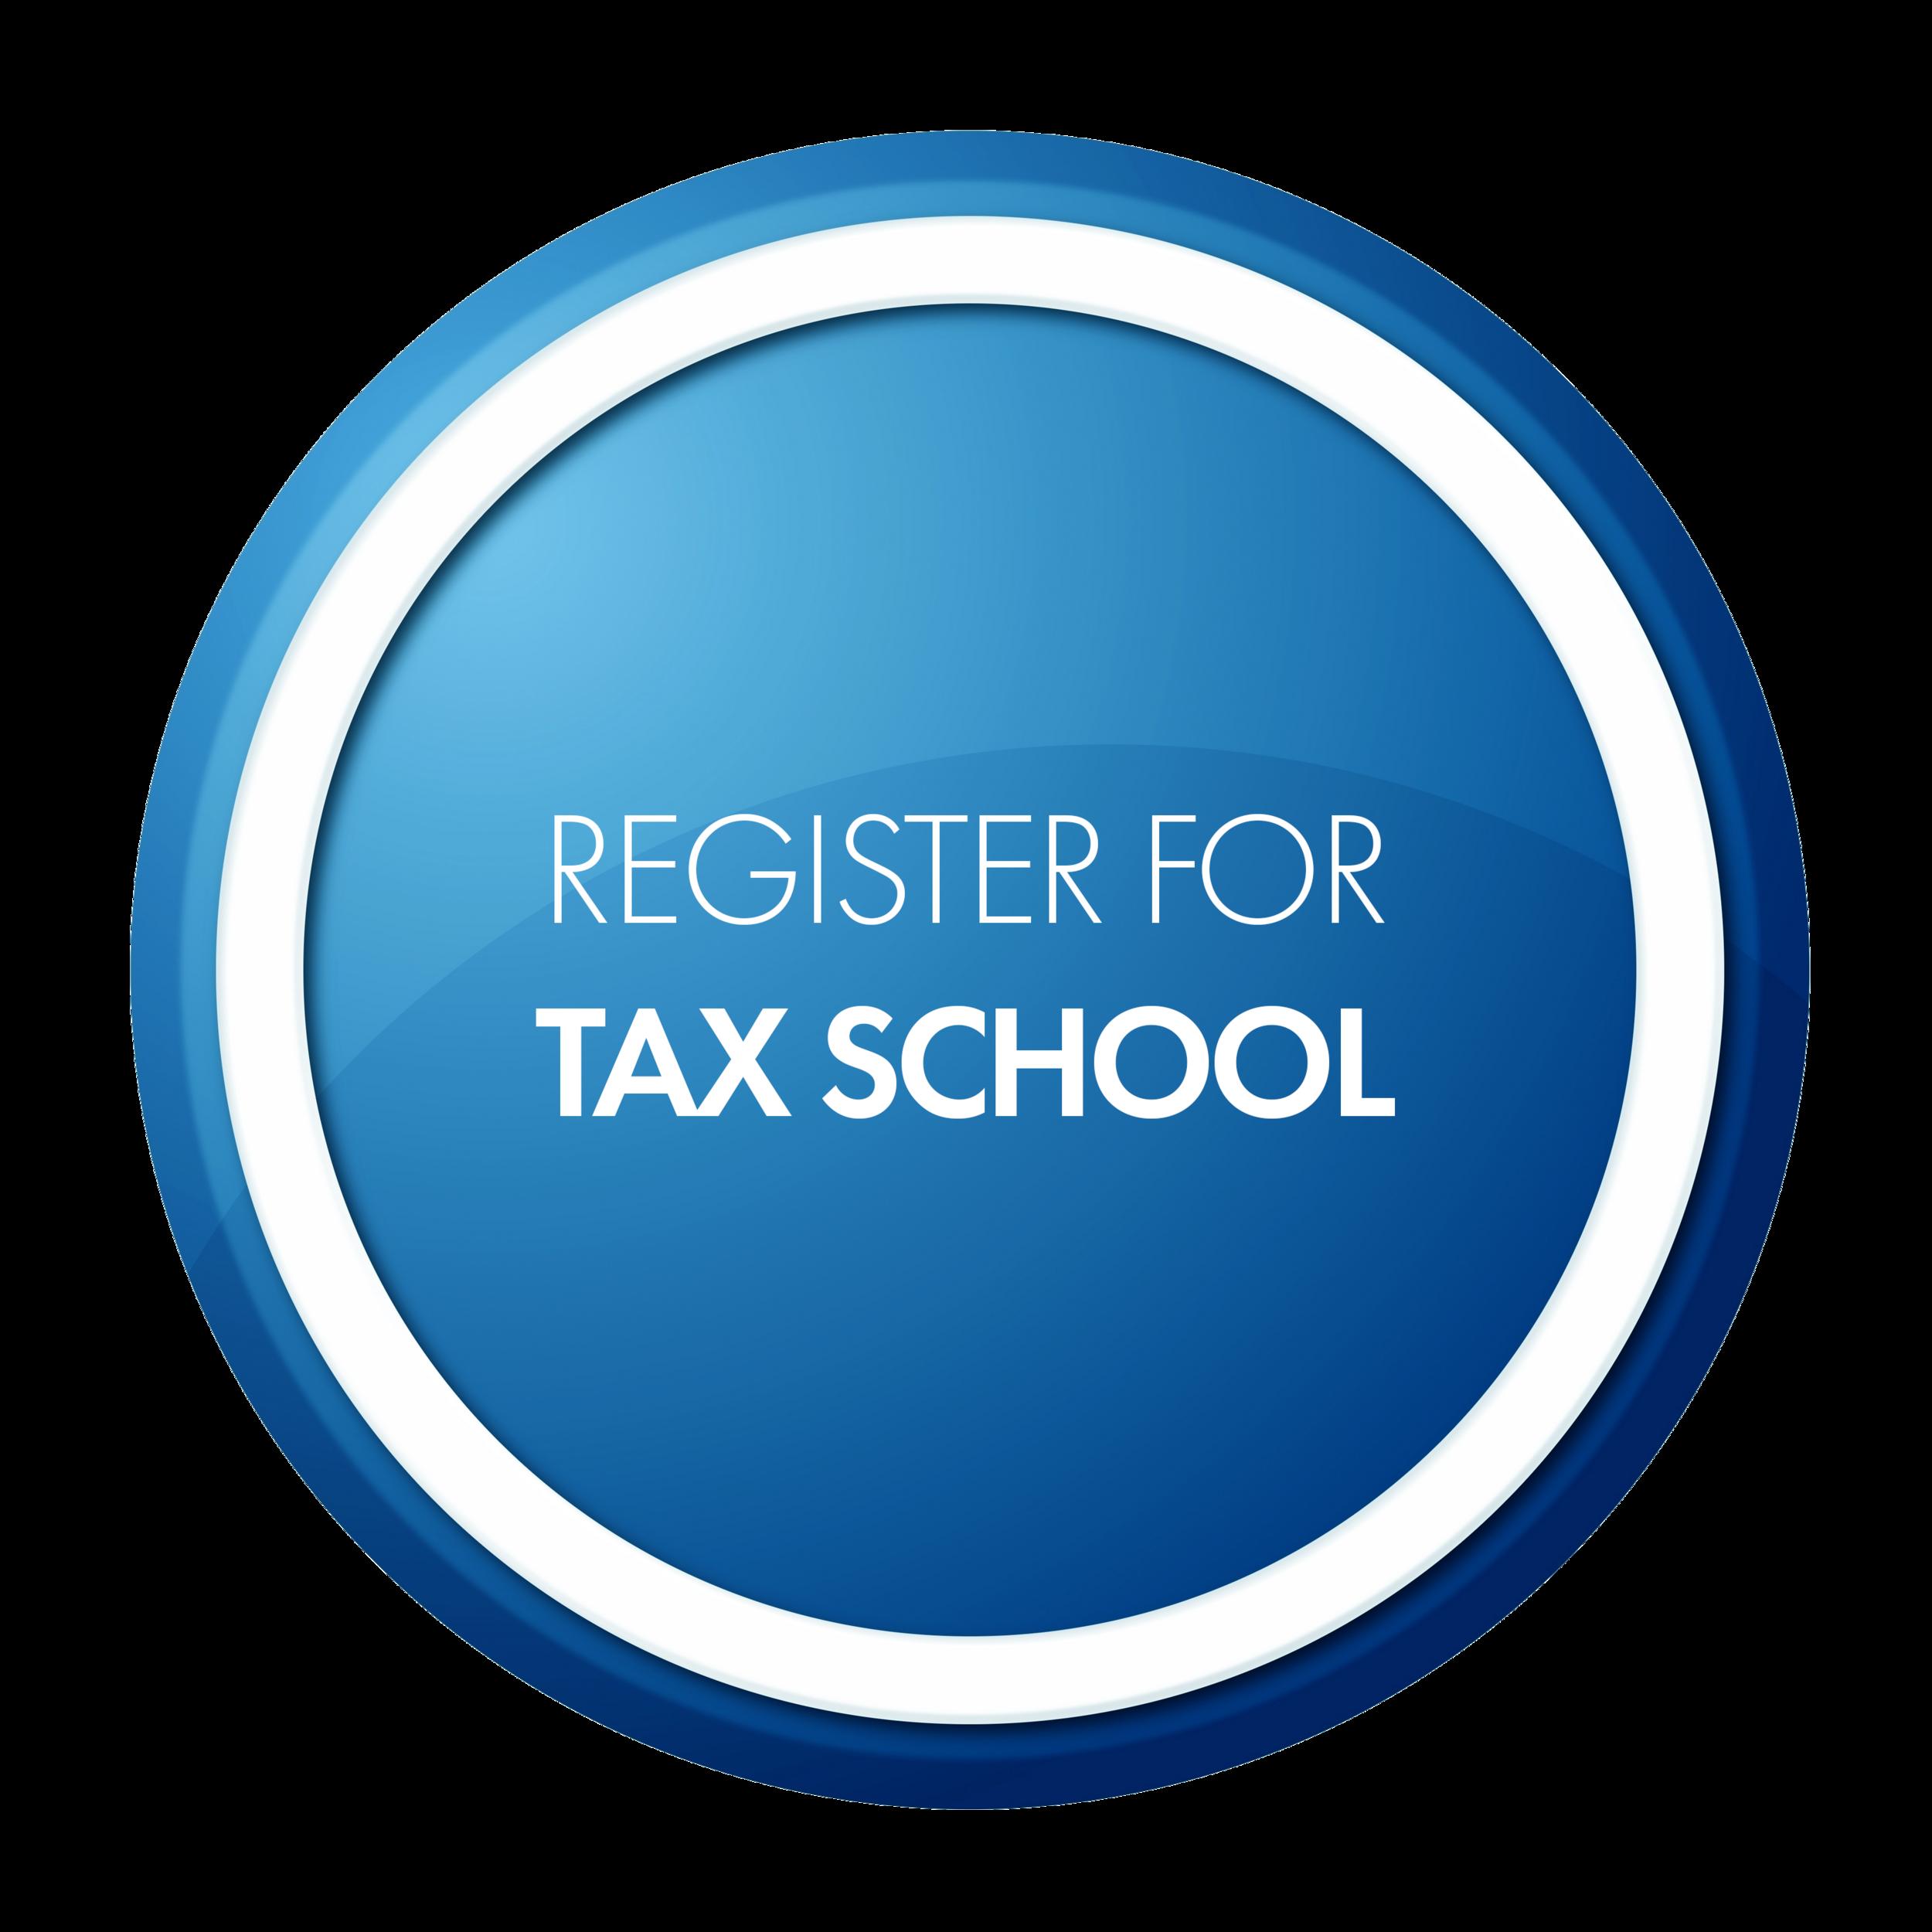 Register For Tax School